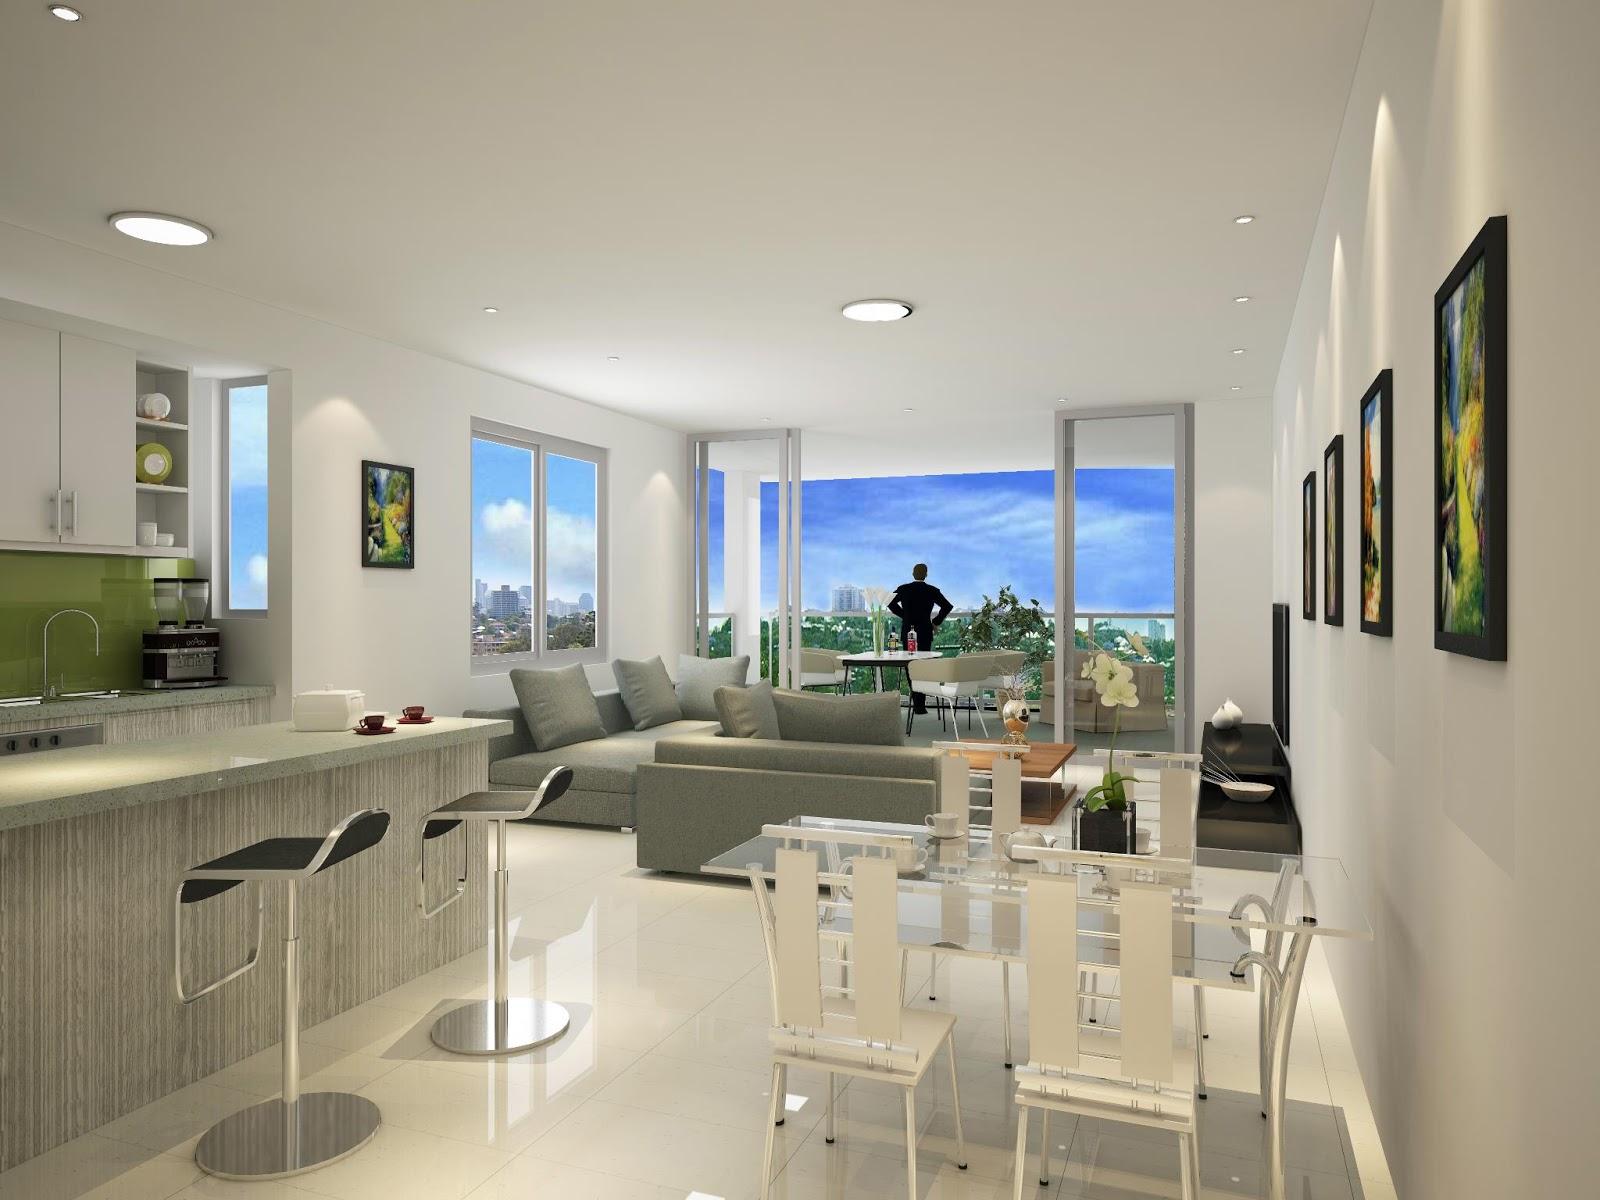 Construindo Minha Casa Clean: Salas modernas de Estar e Jantar! #165EB5 1600 1200